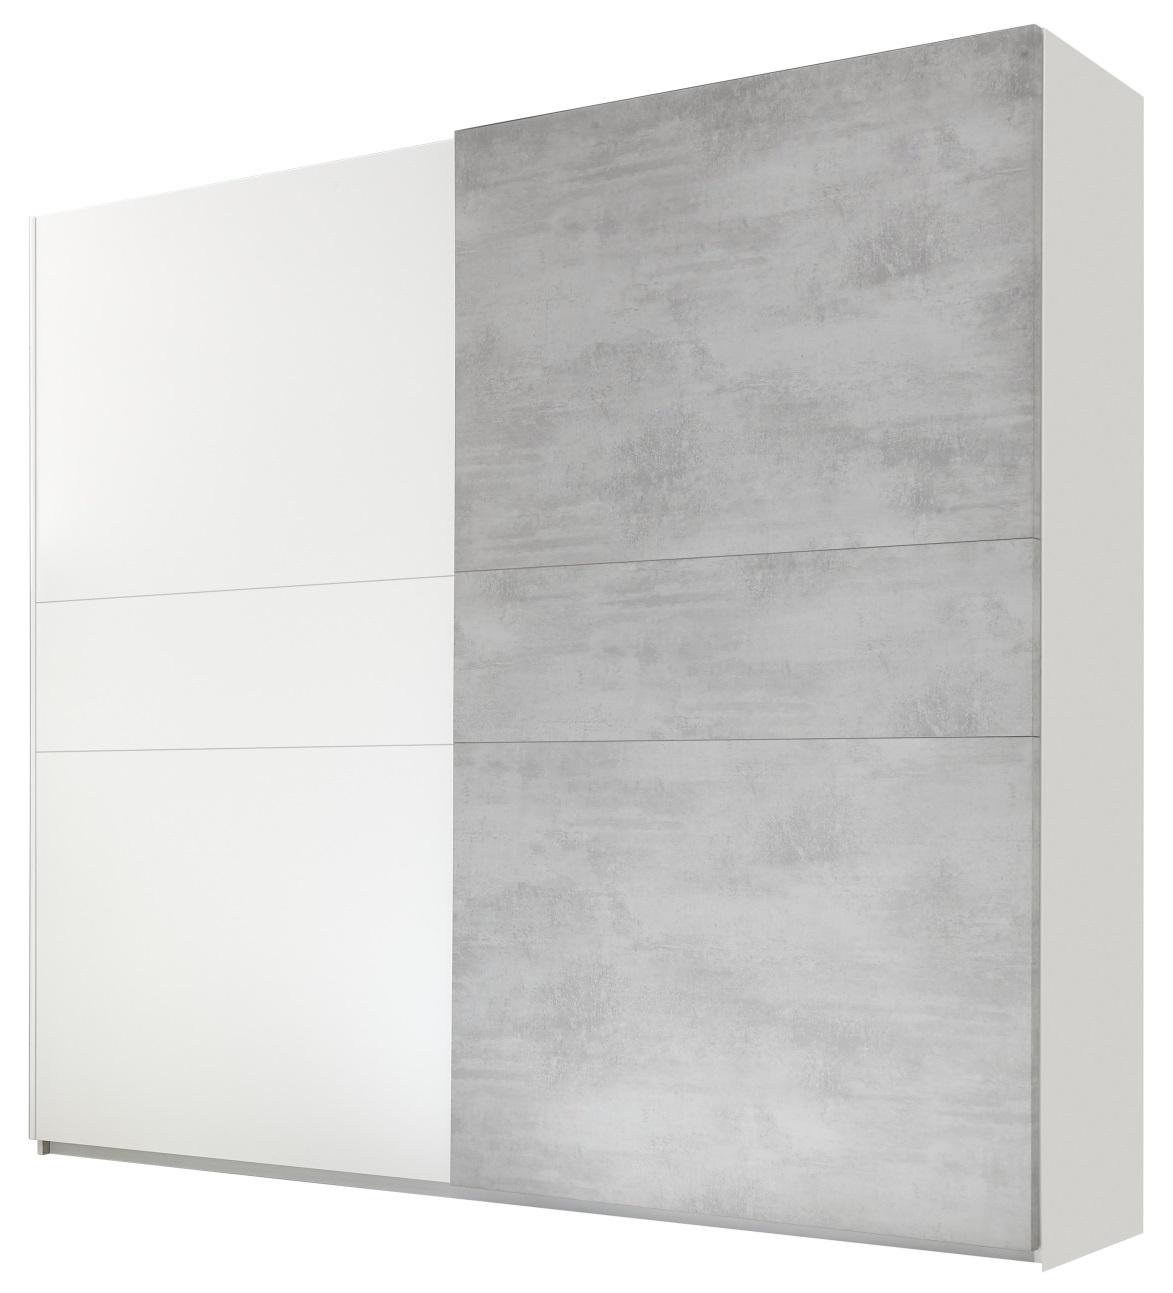 slaapkamerkast zweefdeurkast Amalti 220 cm breed in mat wit met grijs beton